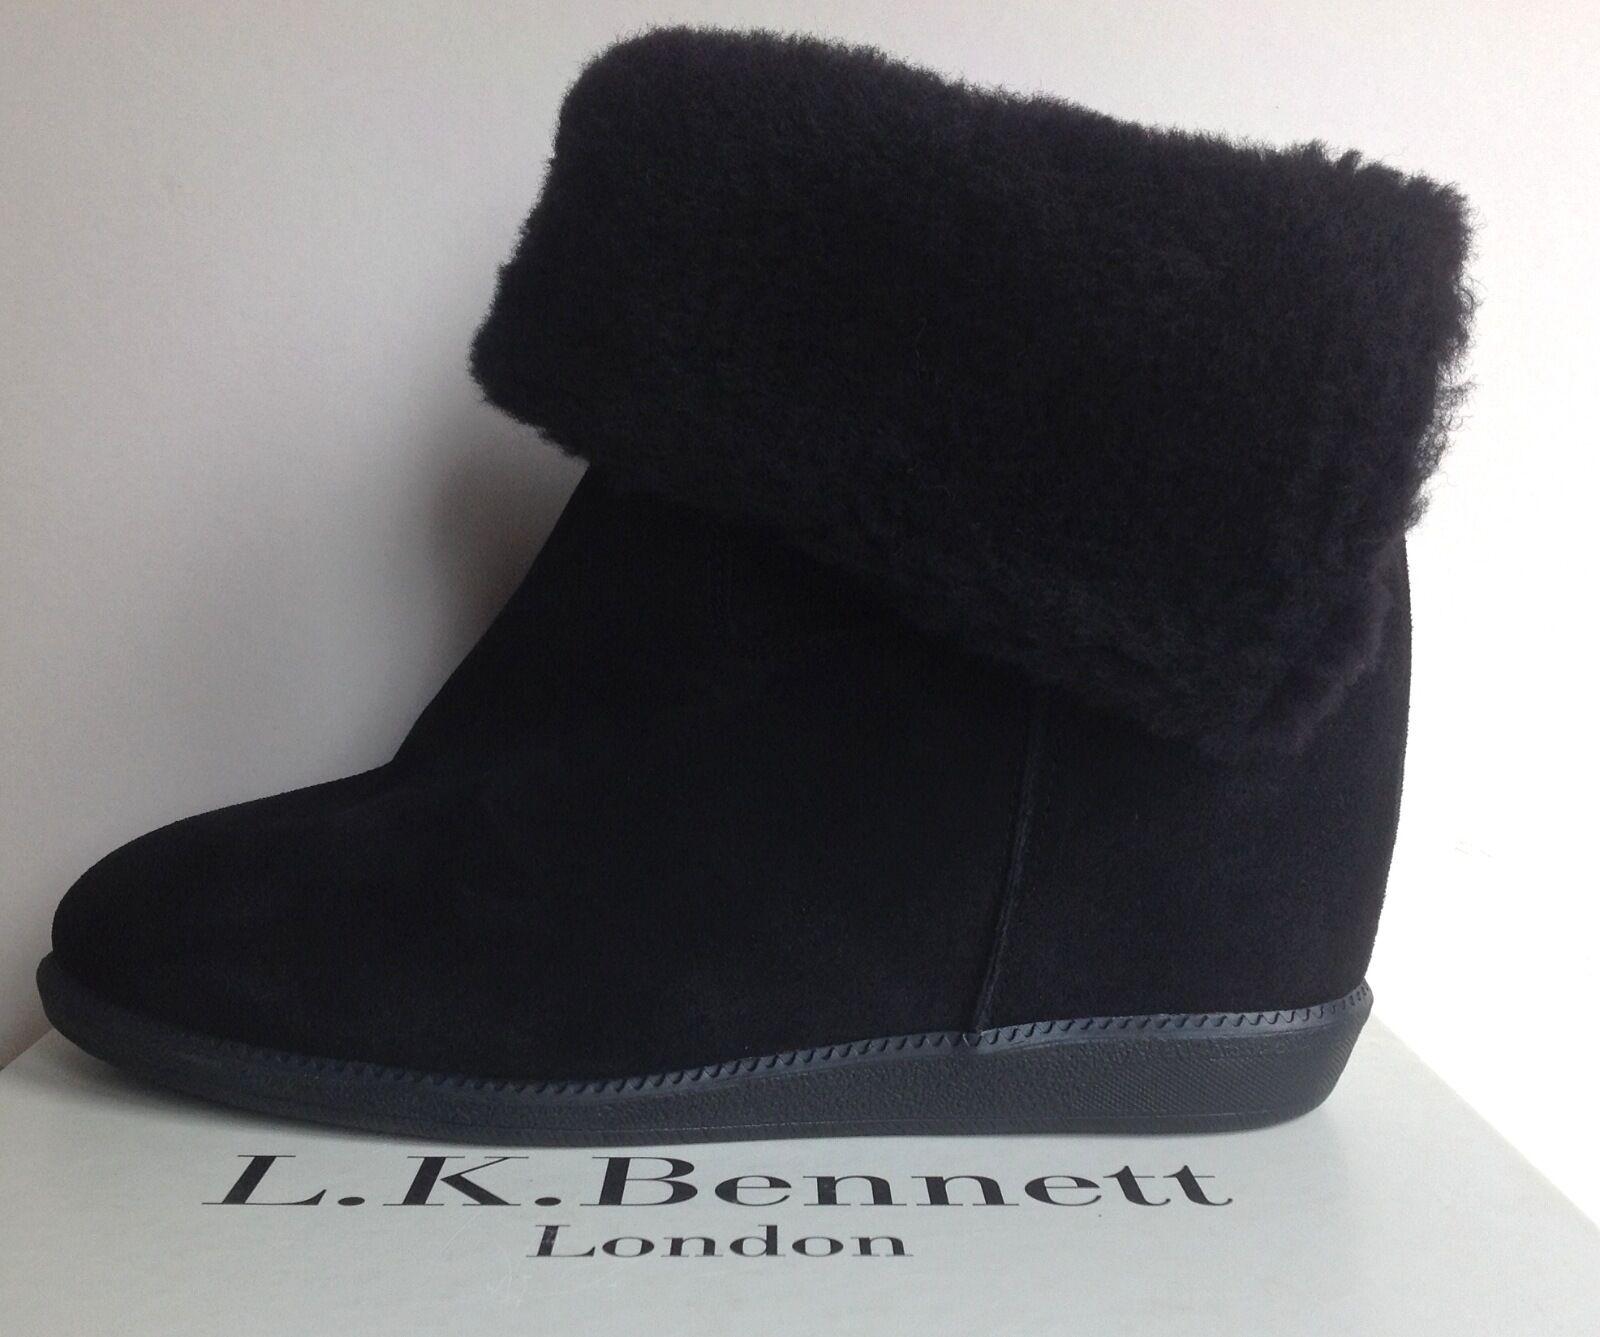 Nuevo fue  LK Bennett EU41:/8 Camente Gamuza Negra De Cuña Oculta/Shearling